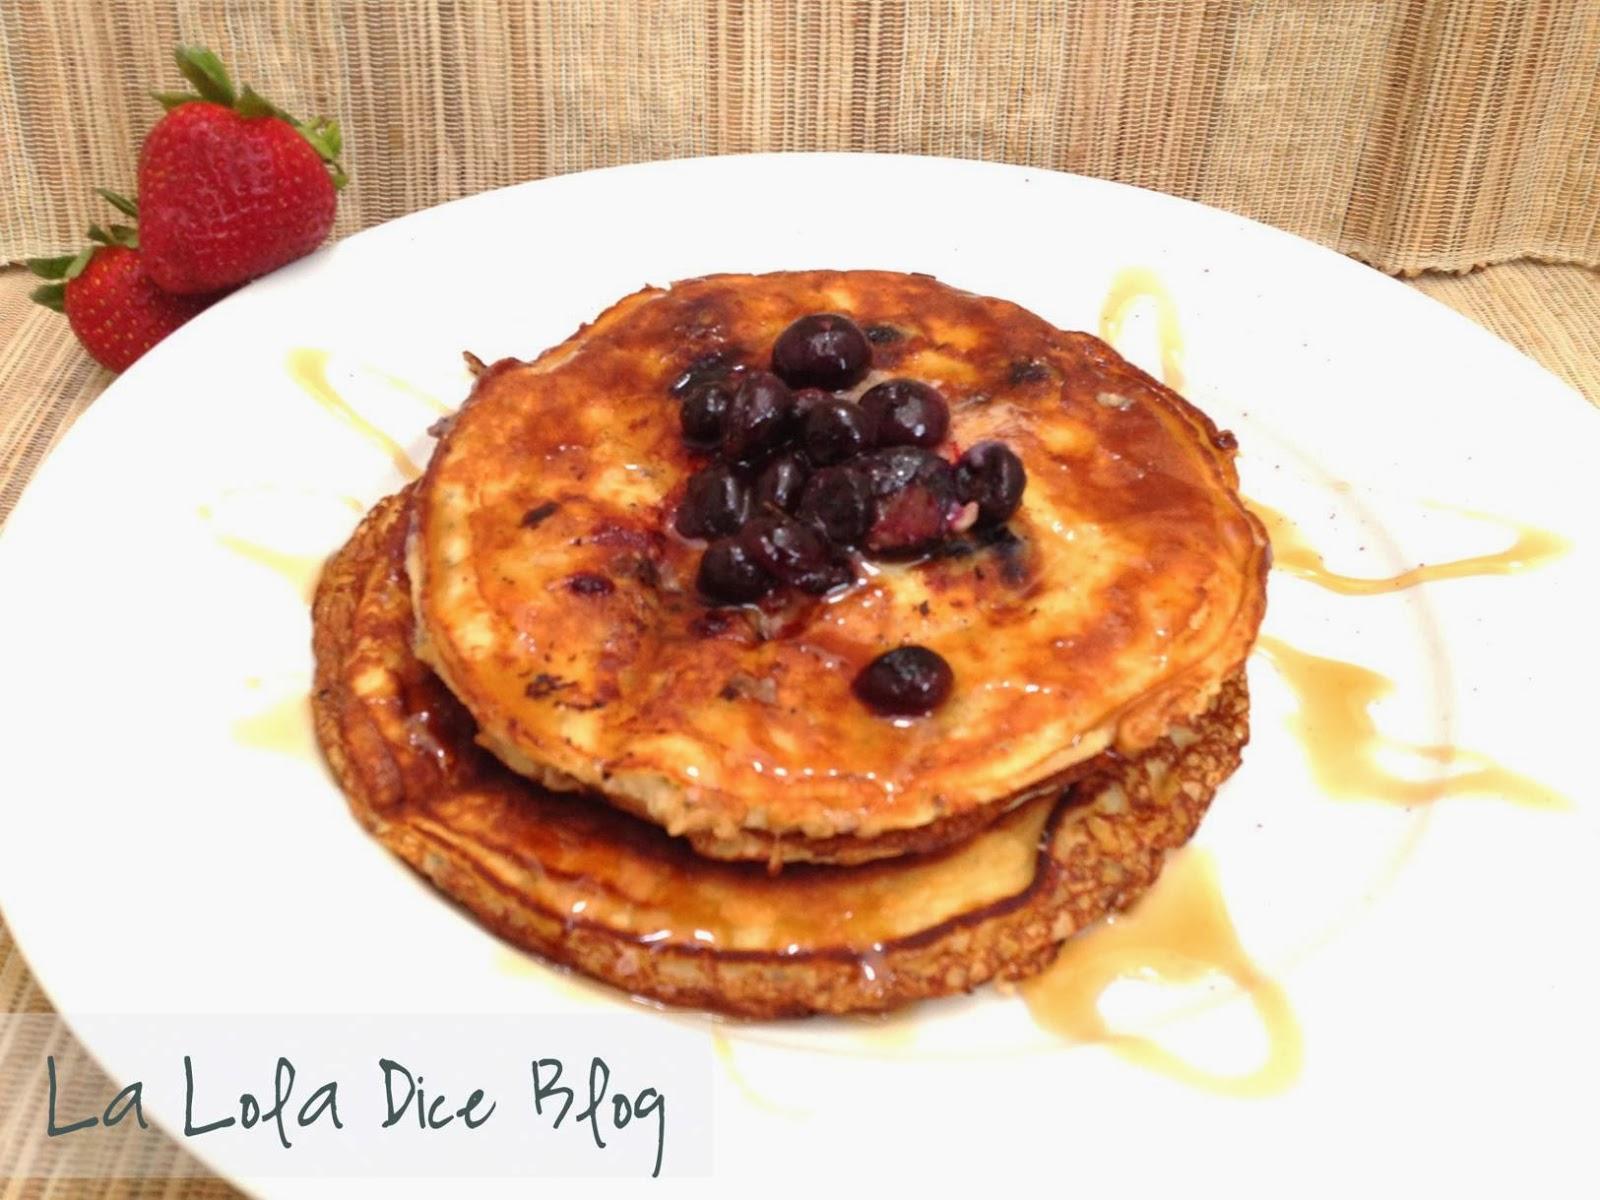 Hot Cakes De Harina De Almendras La Lola Dice